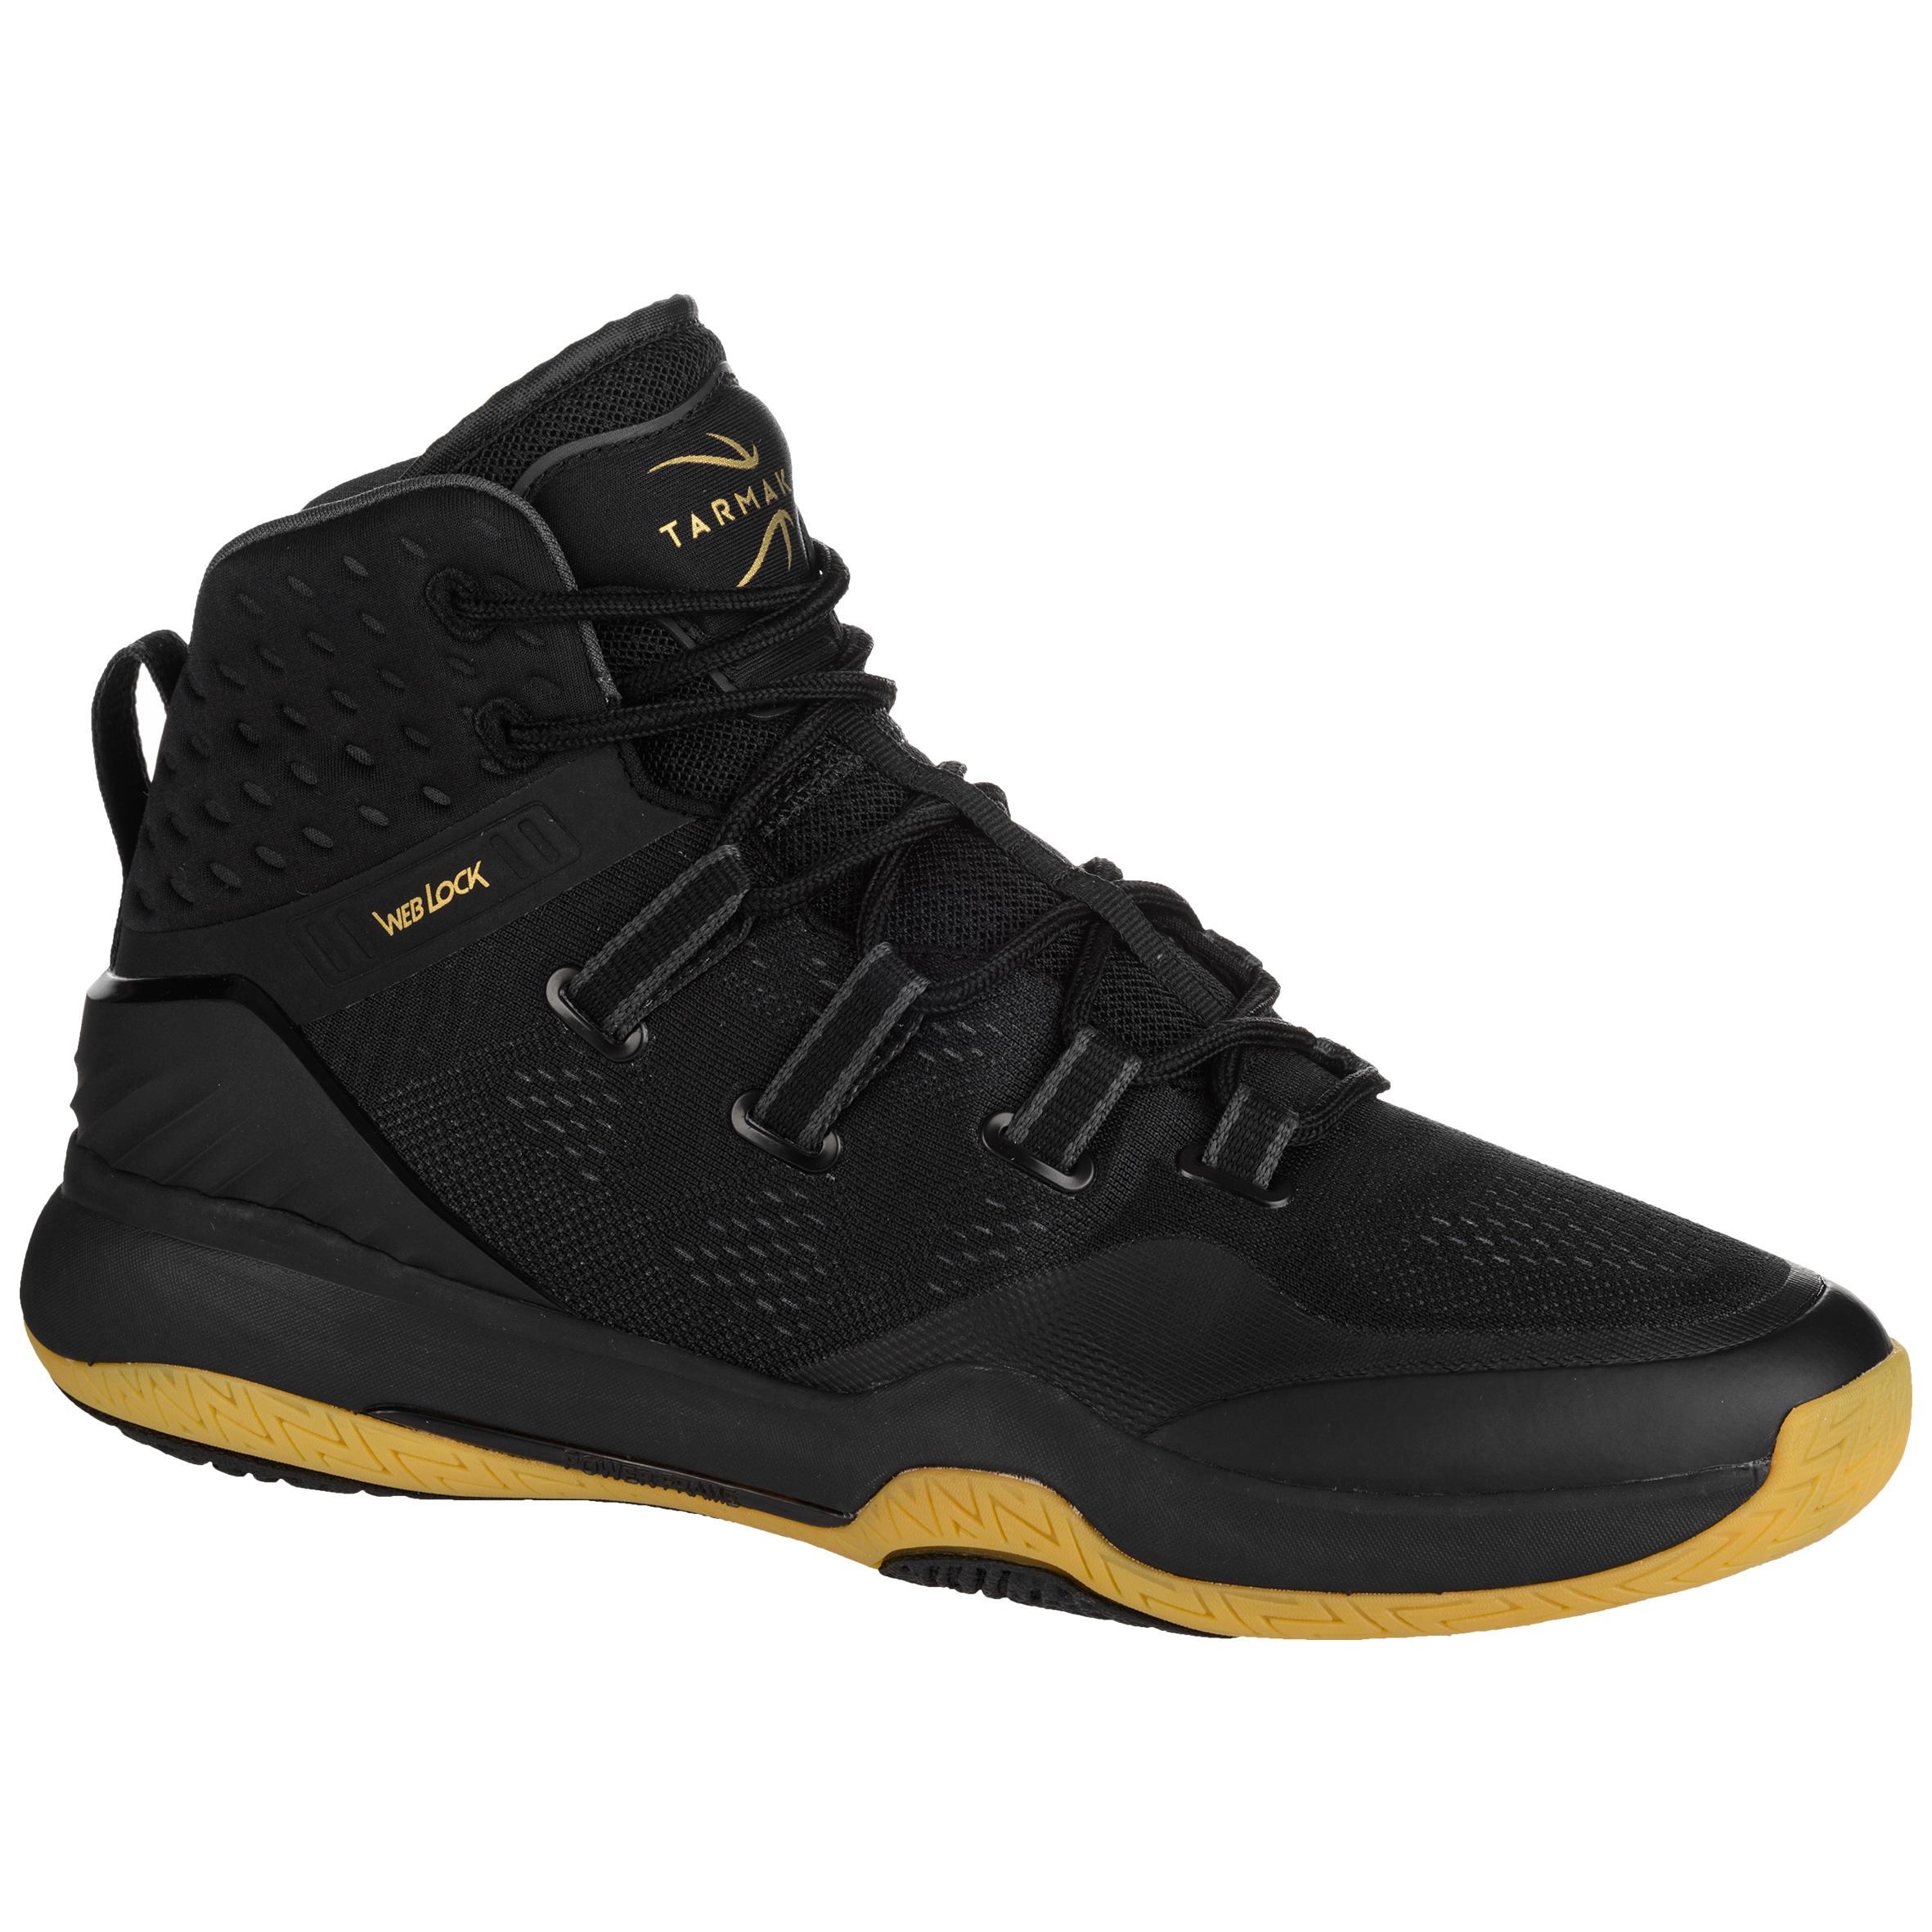 Tarmak Basketball Shoes for Men